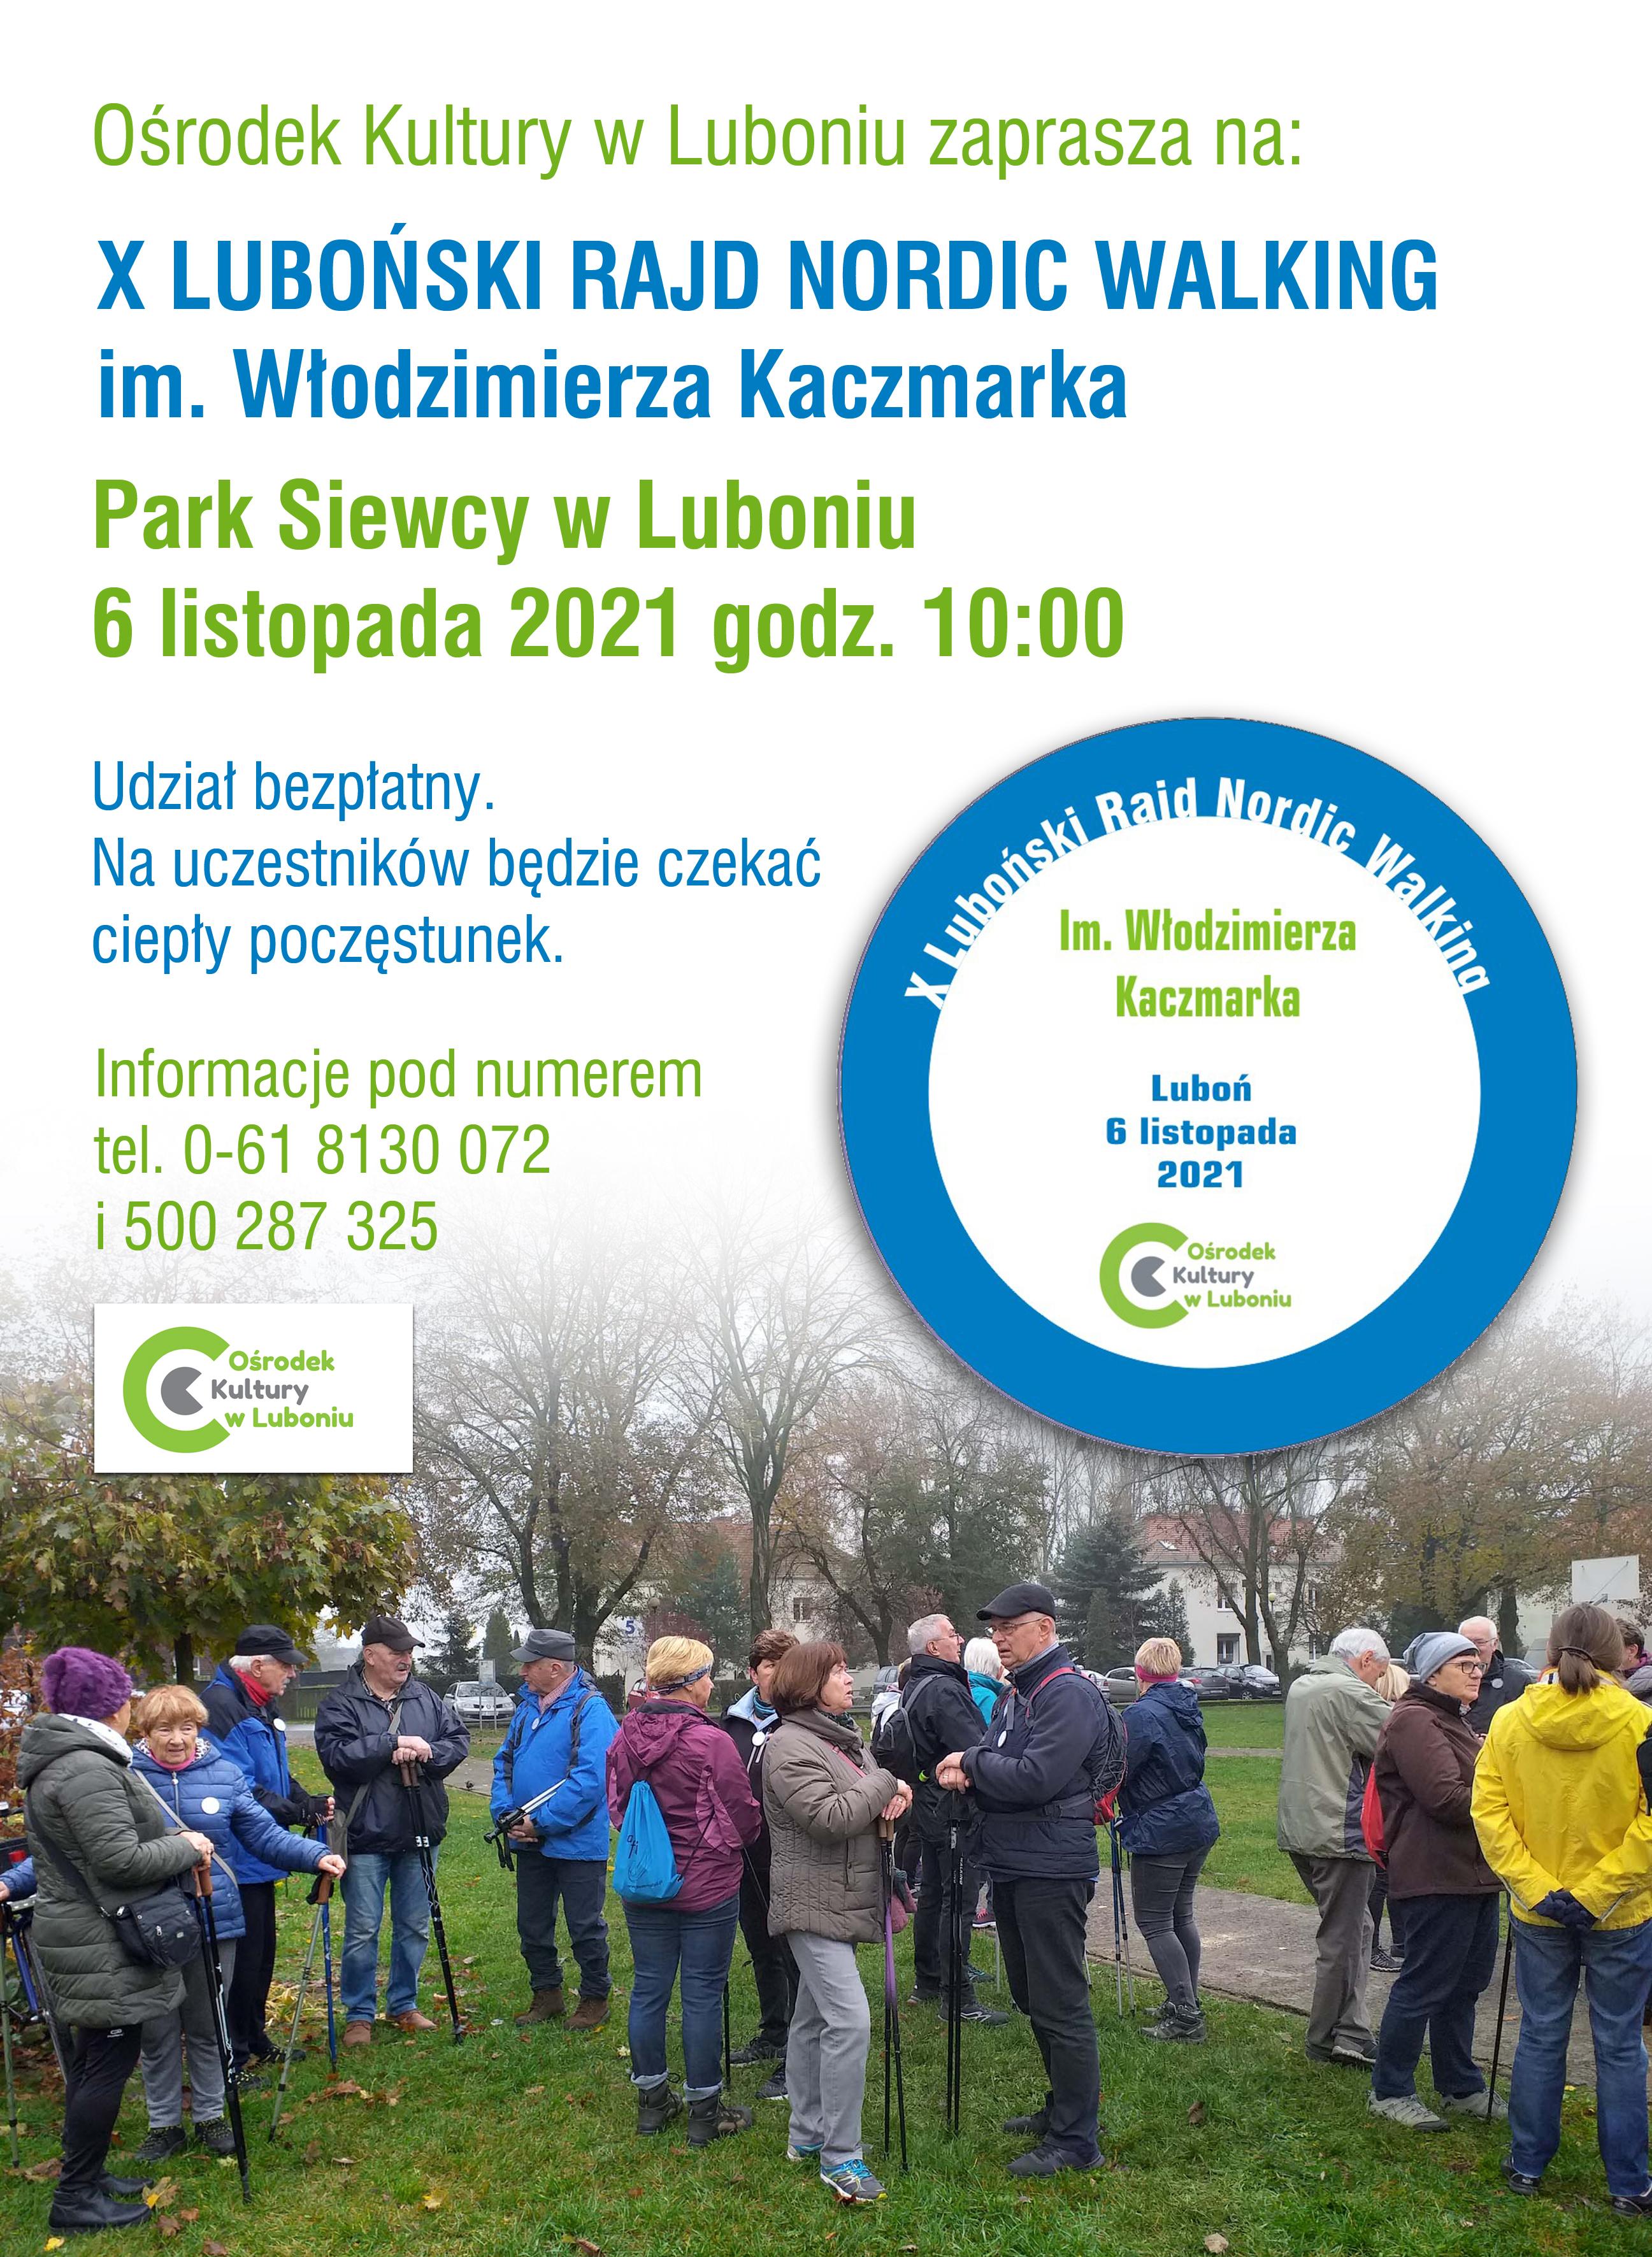 X Luboński Rajd Nordic Walking